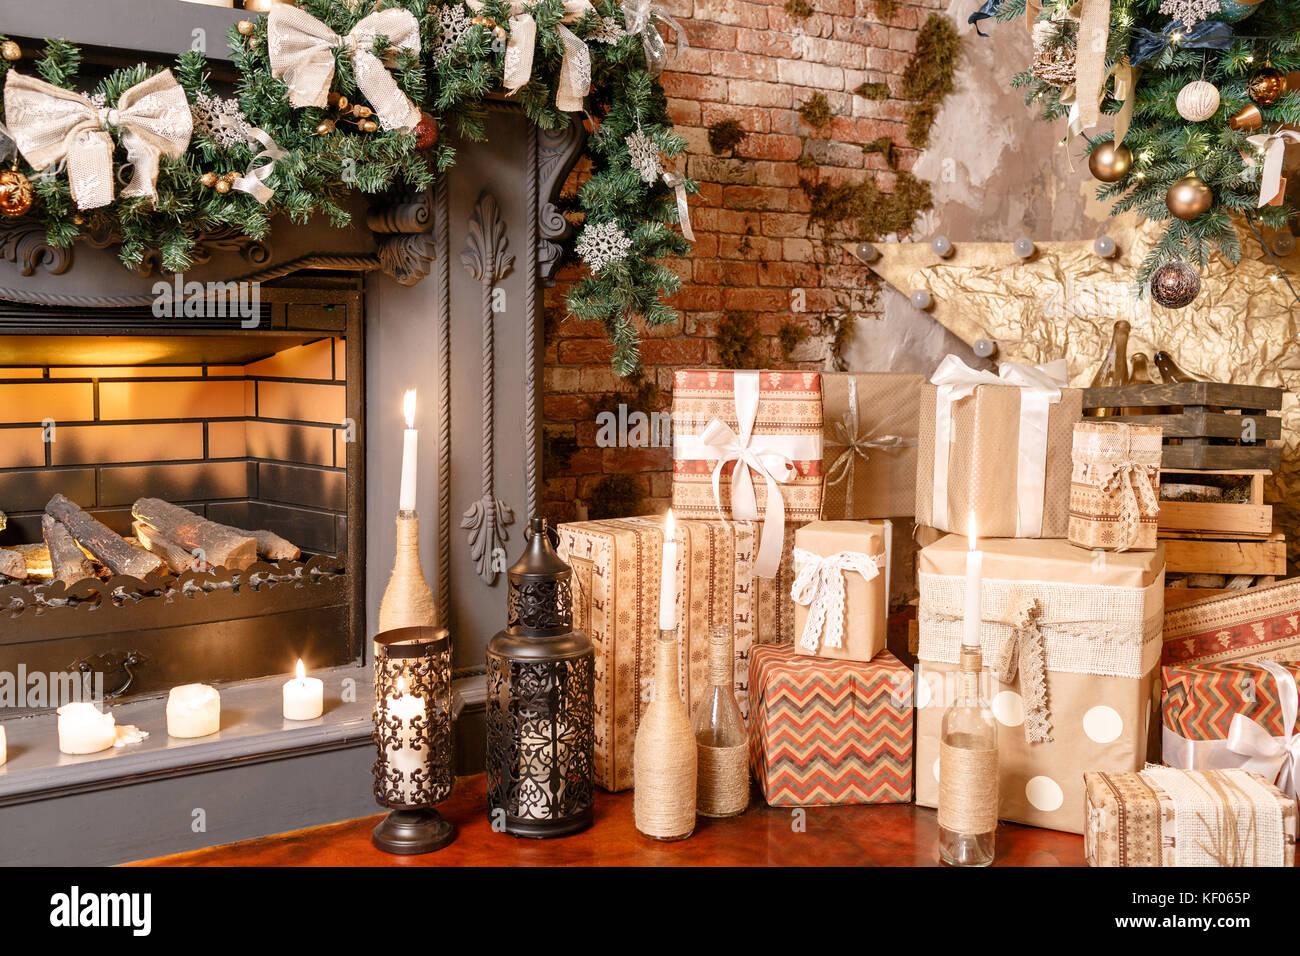 Upside Down Christmas Tree Ceiling.Alternative Tree Upside Down On The Ceiling Winter Home